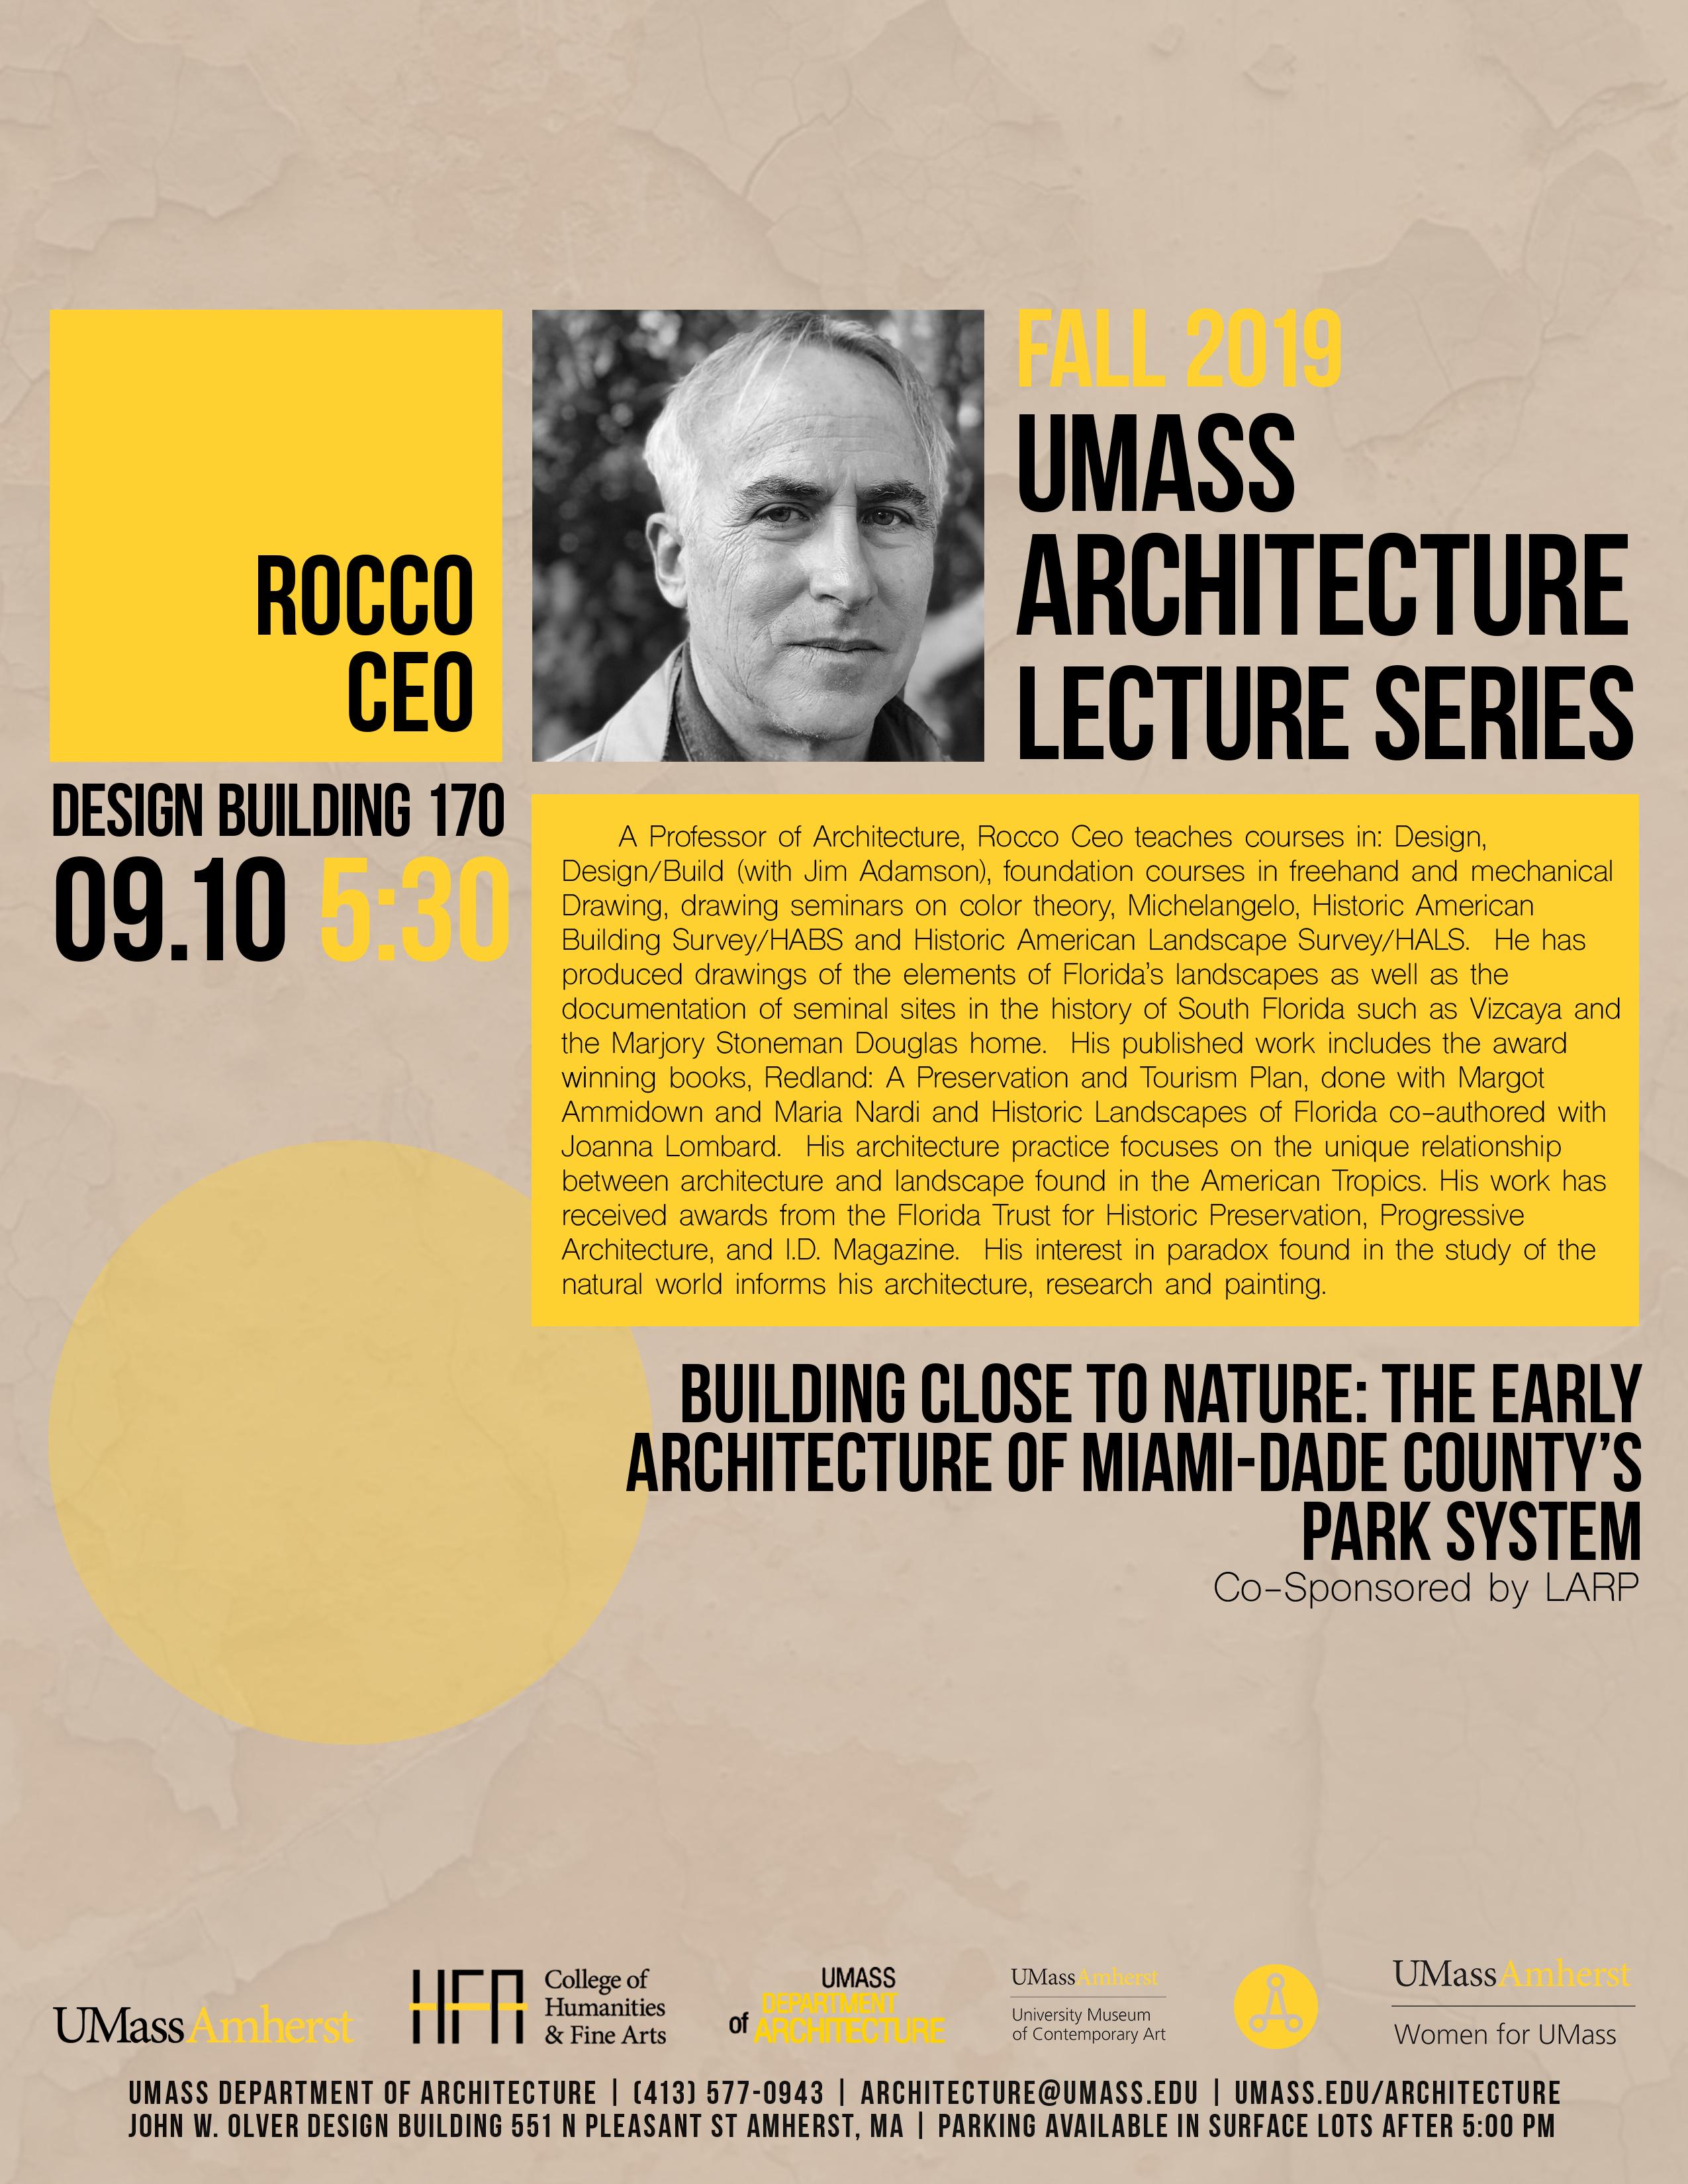 Rocco Ceo lecture poster